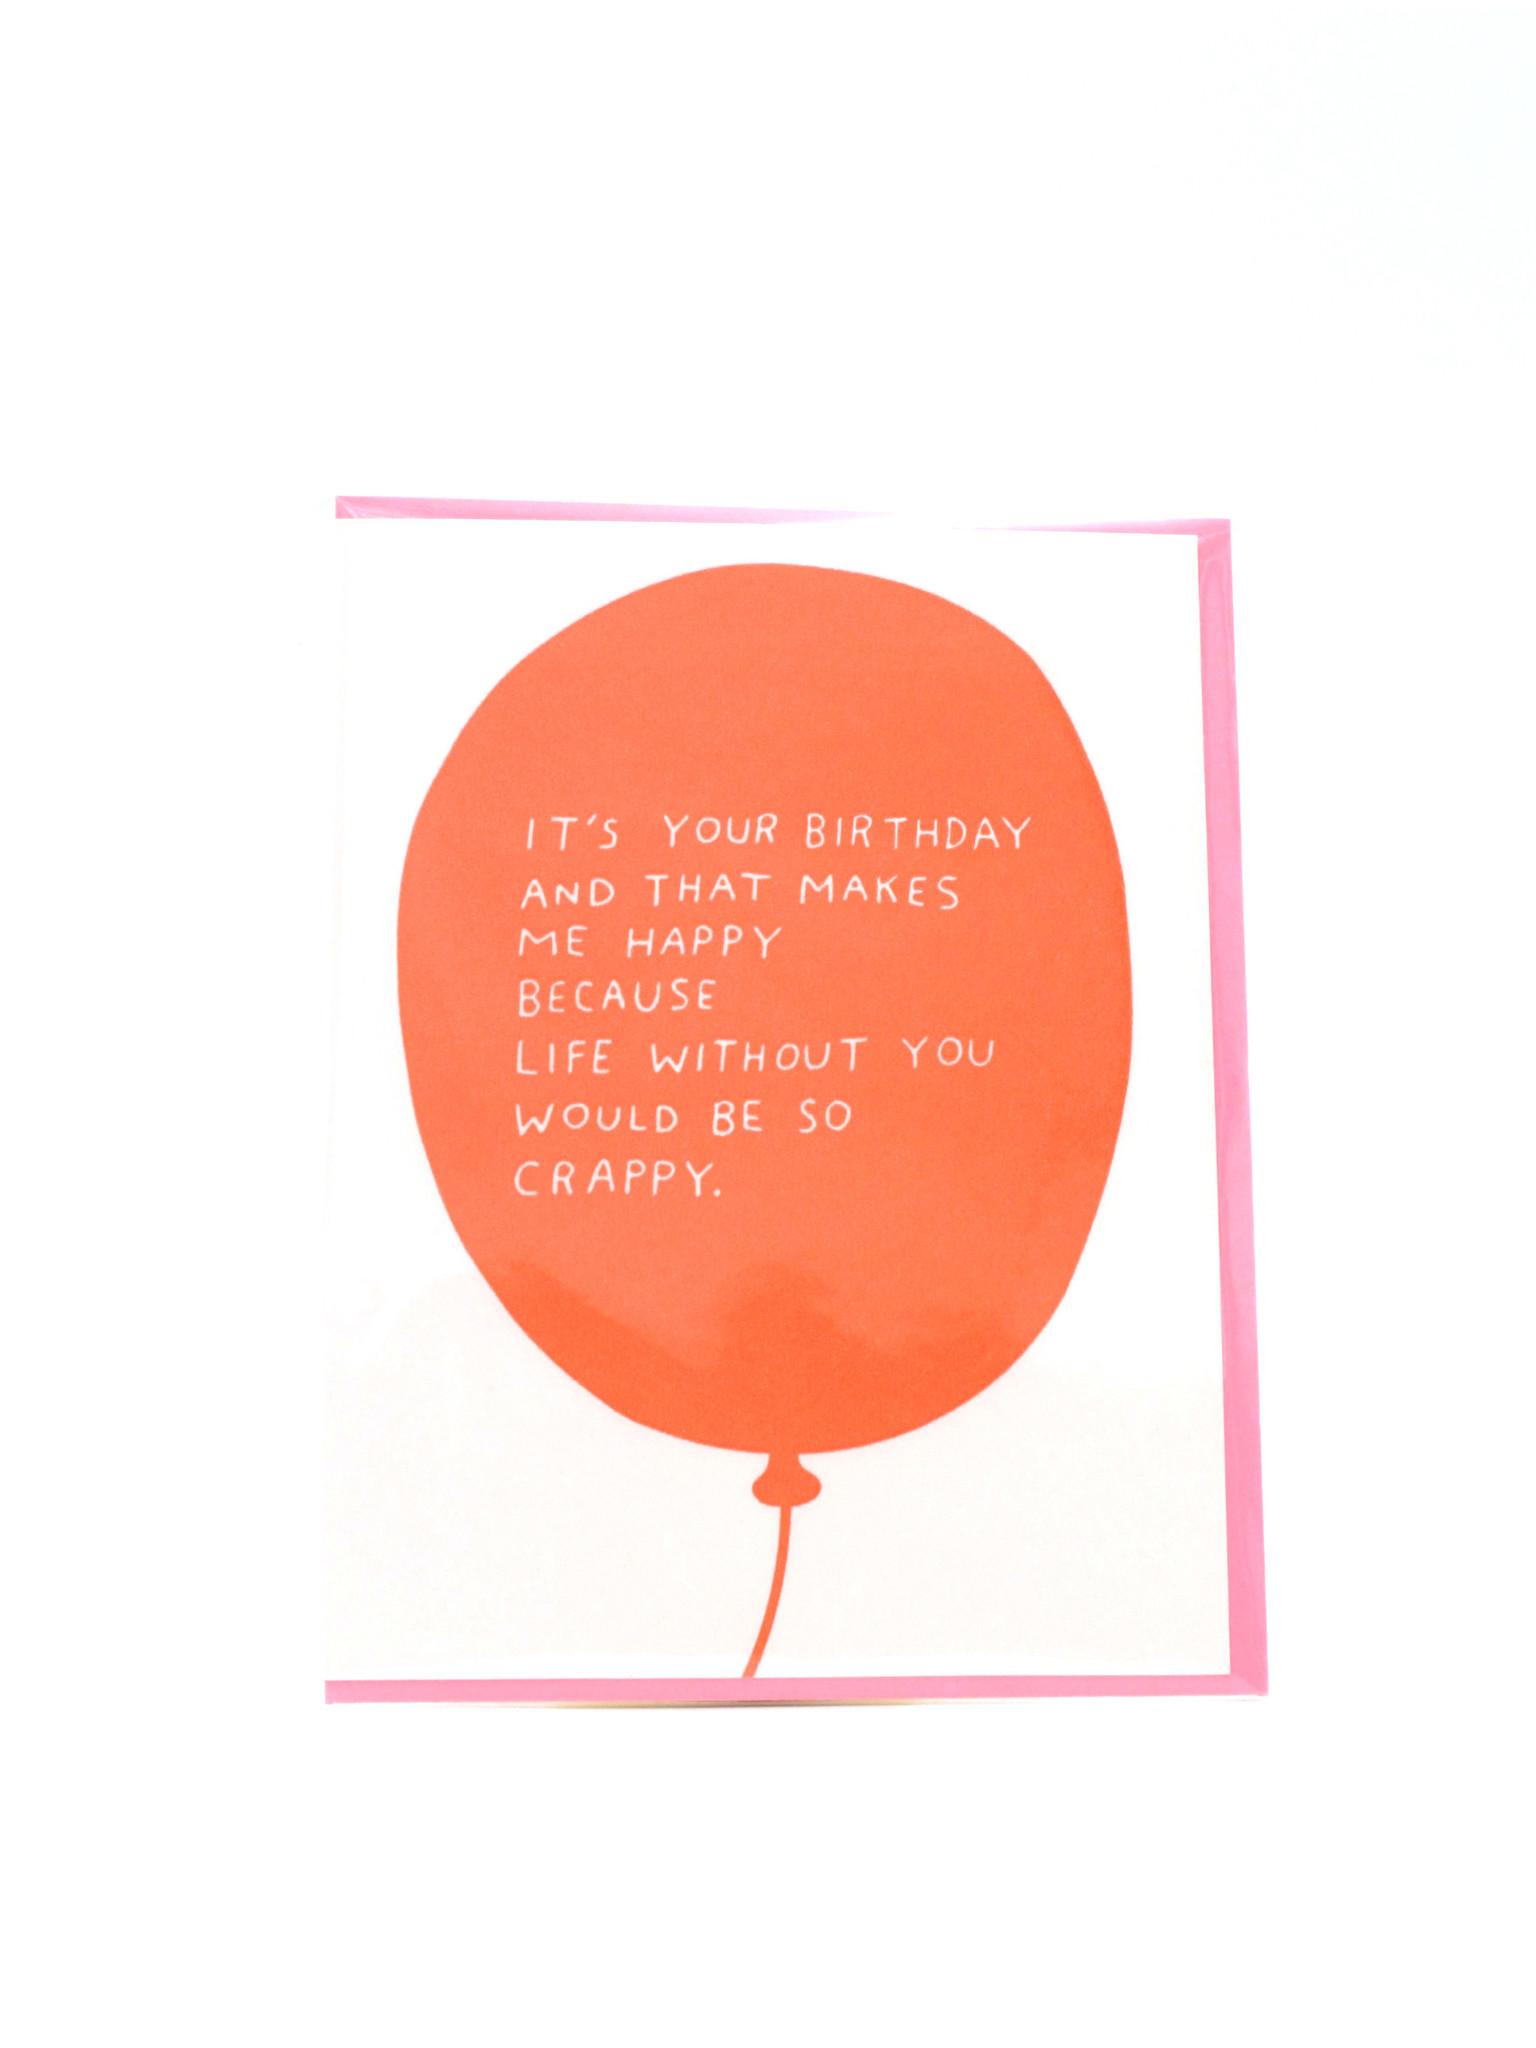 Egg Press Makes Me Happy Birthday Balloon Greeting Card